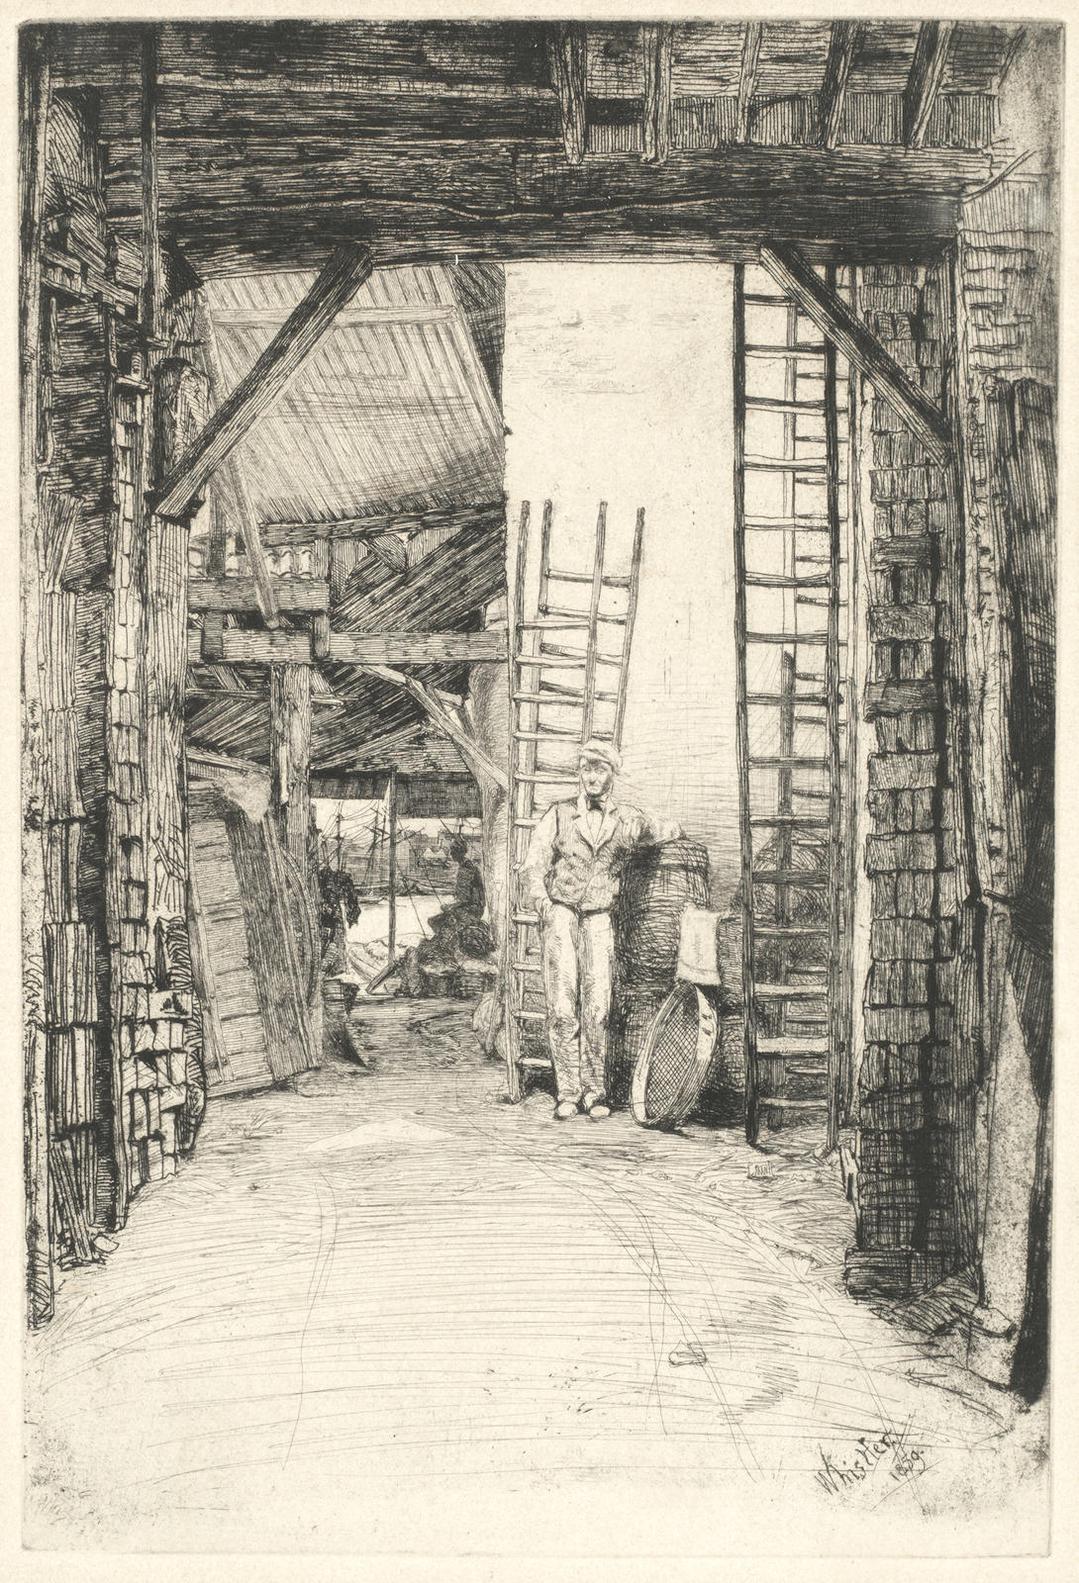 James Abbott McNeill Whistler-The Lime-Burner, From The Thames Set (Kennedy 46)-1859